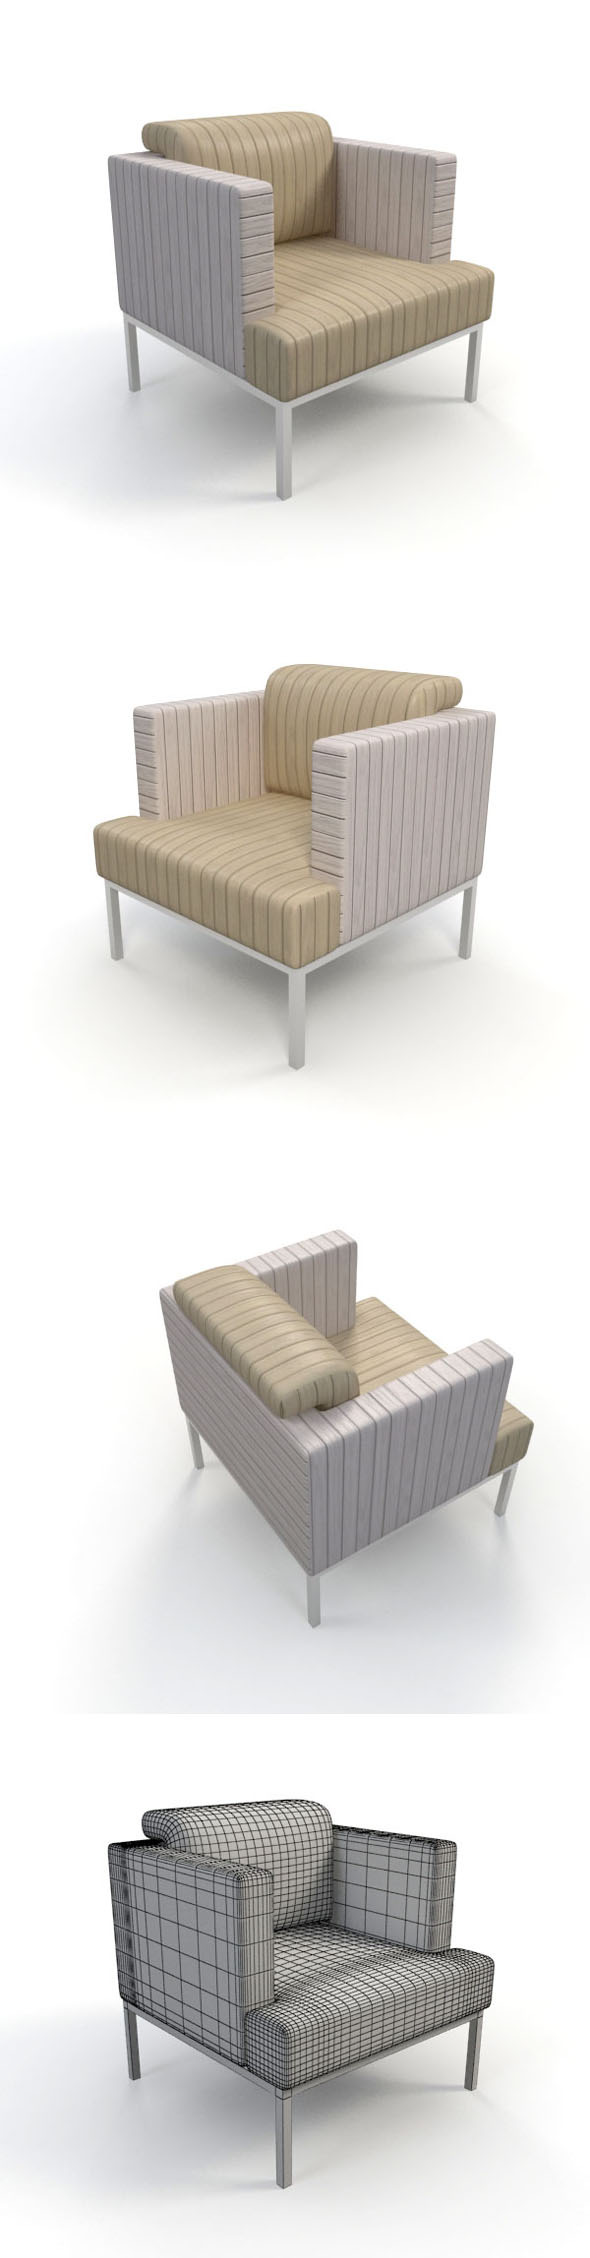 3DOcean Sofa-12 11628215